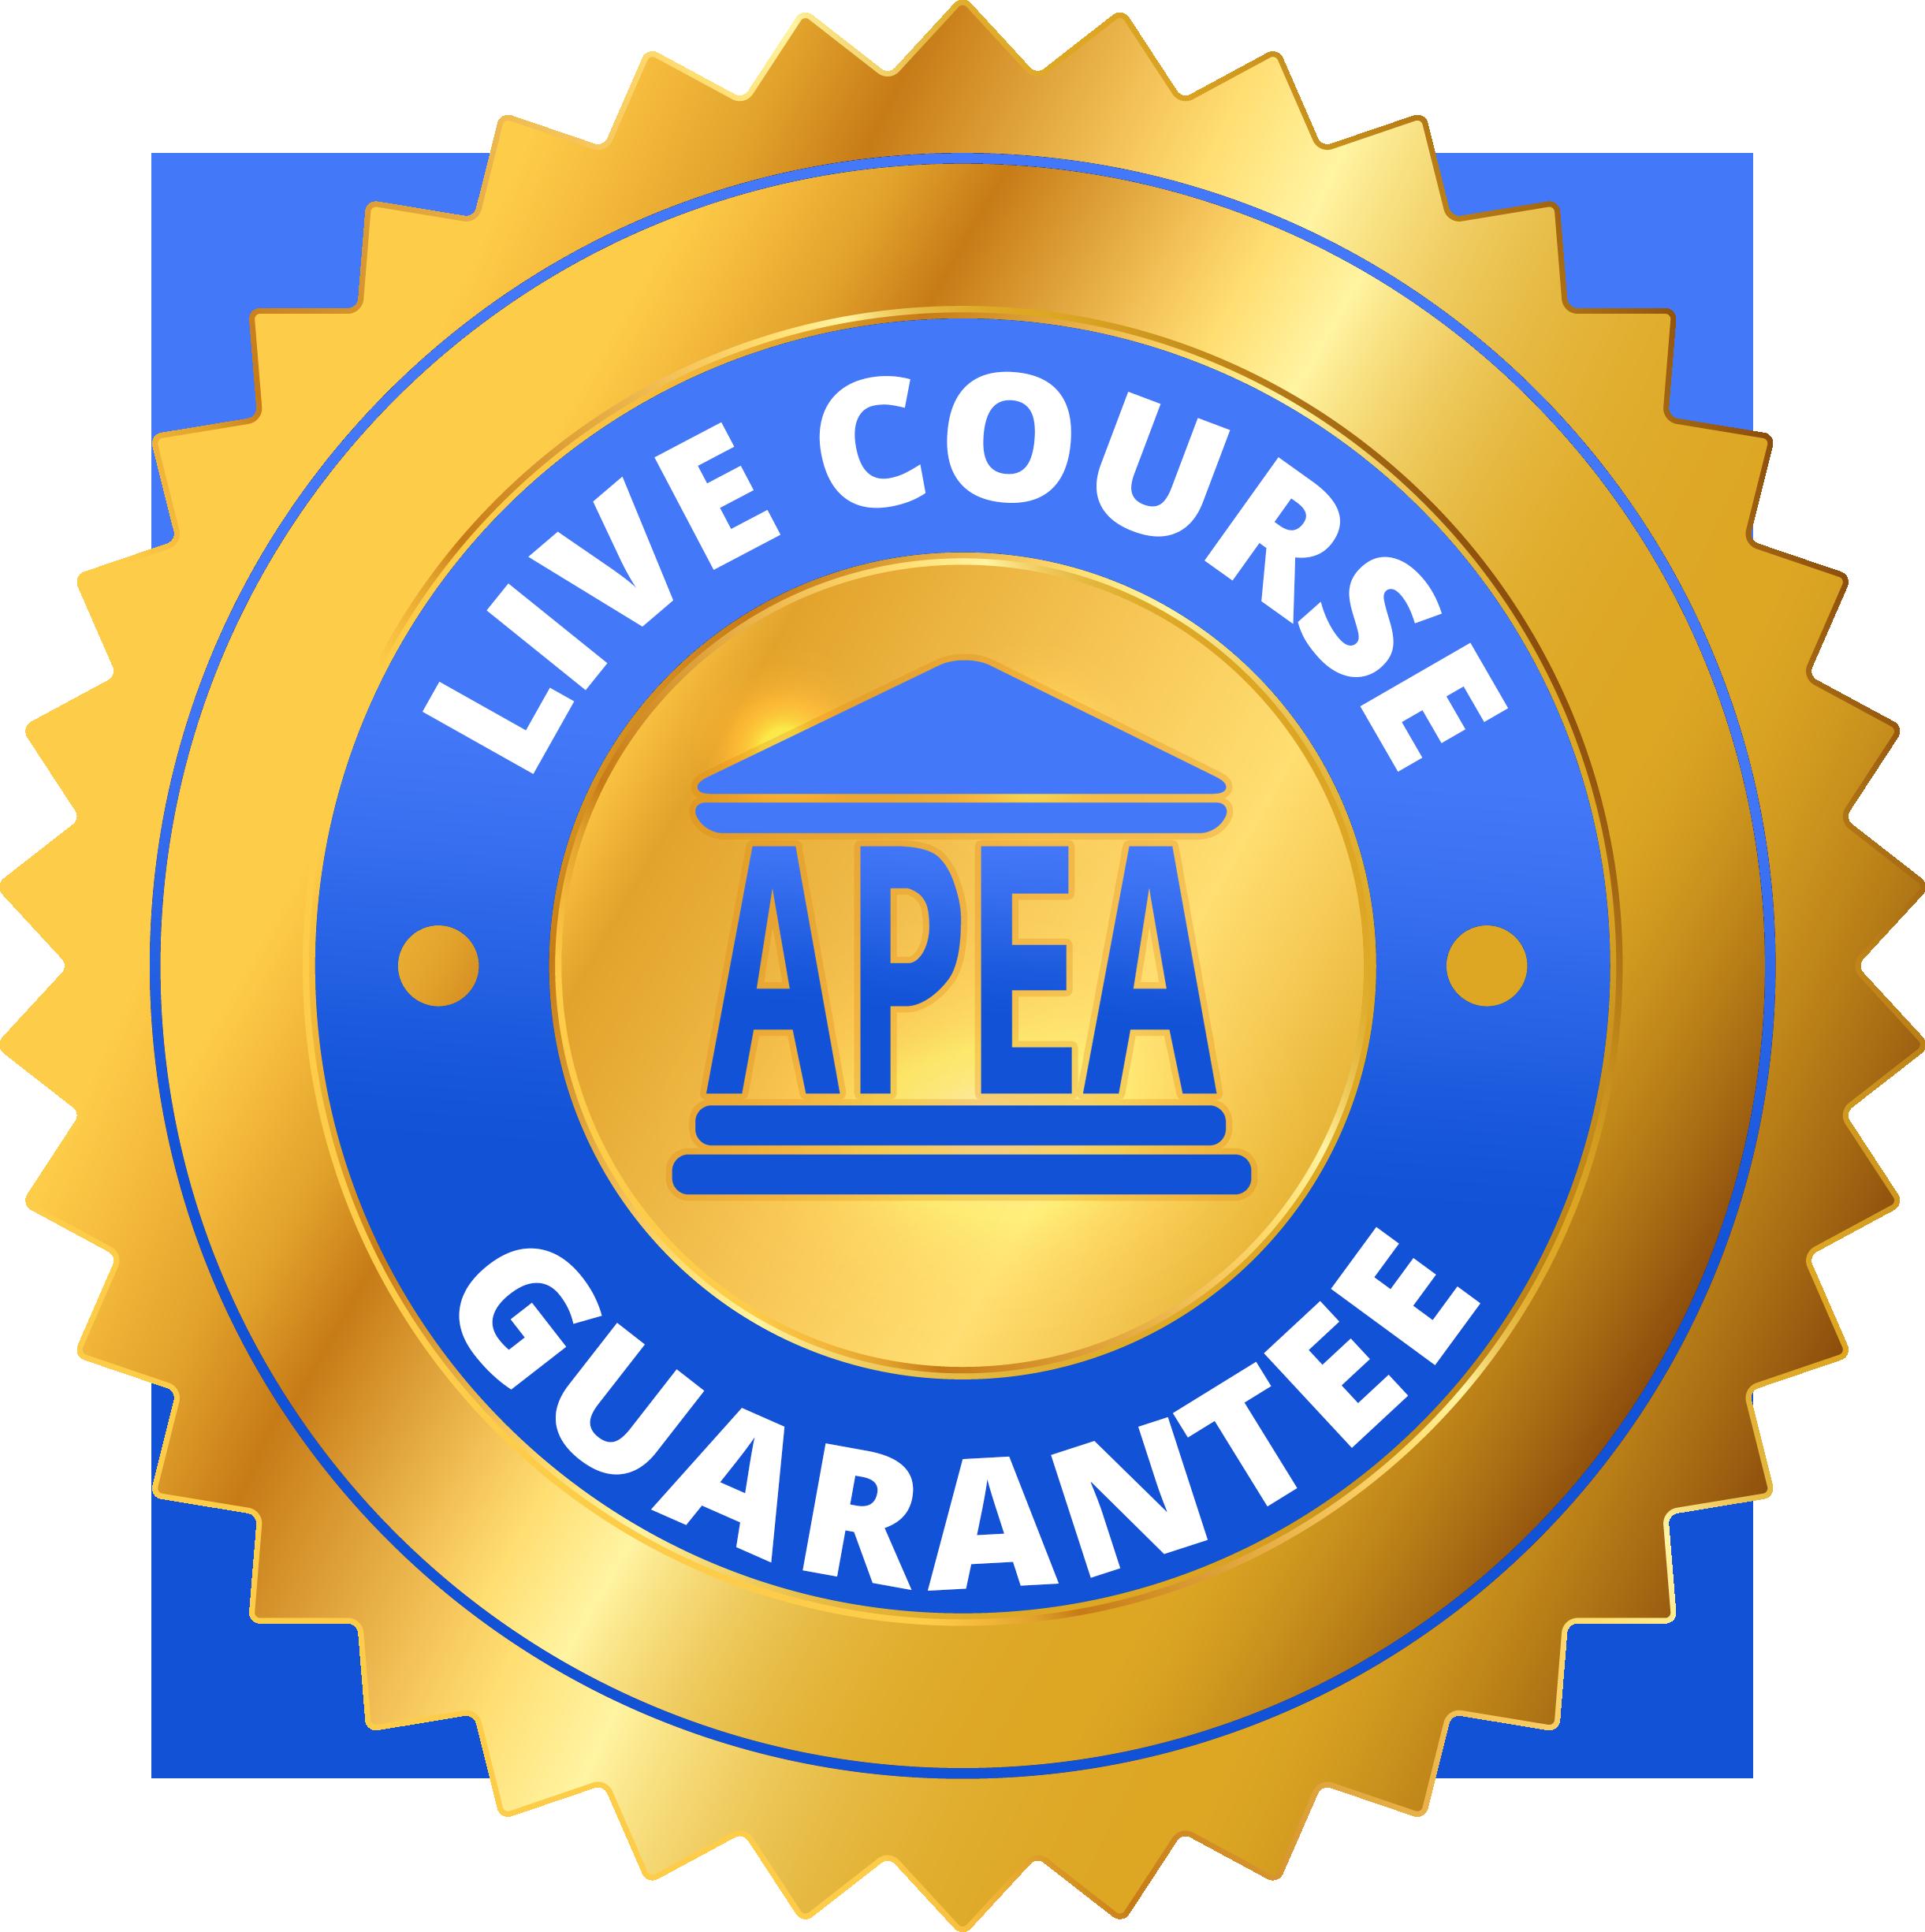 APEA Live Review Course Guarantee